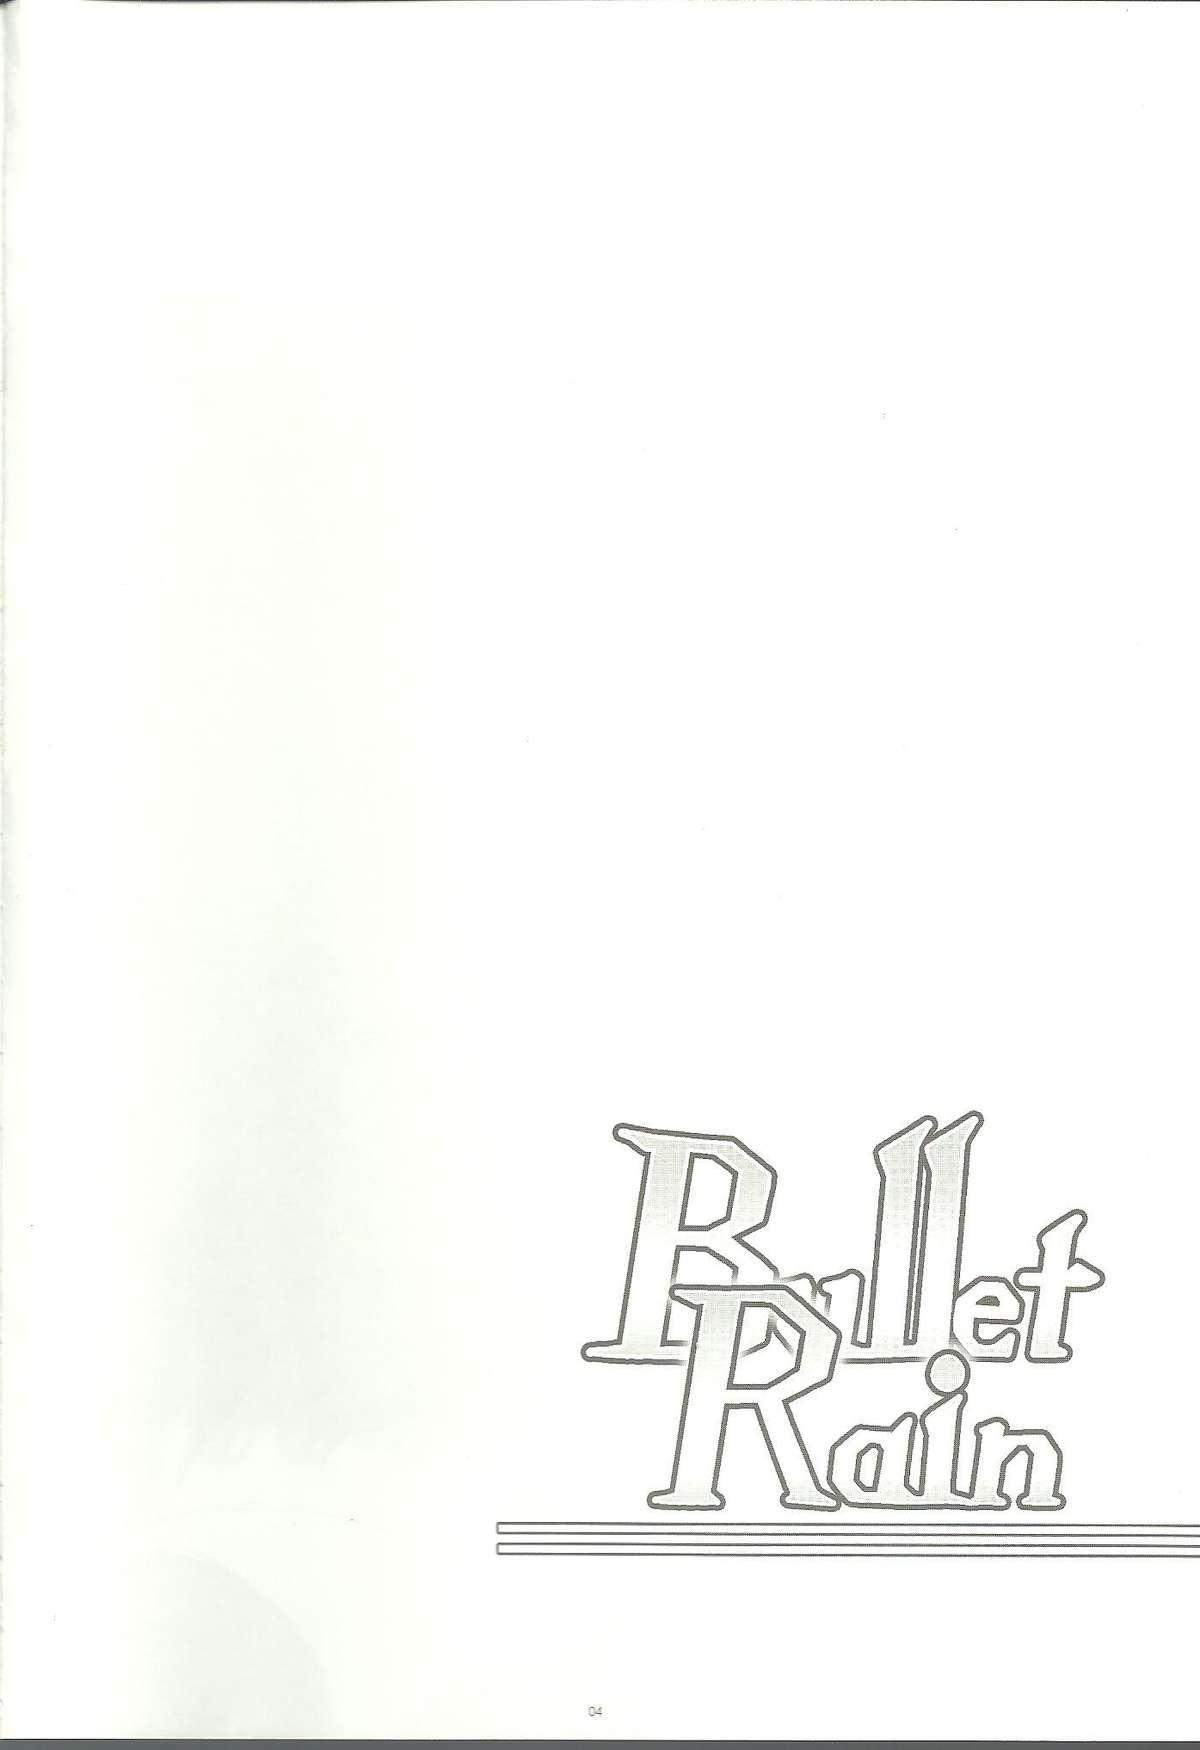 BulletRain 2